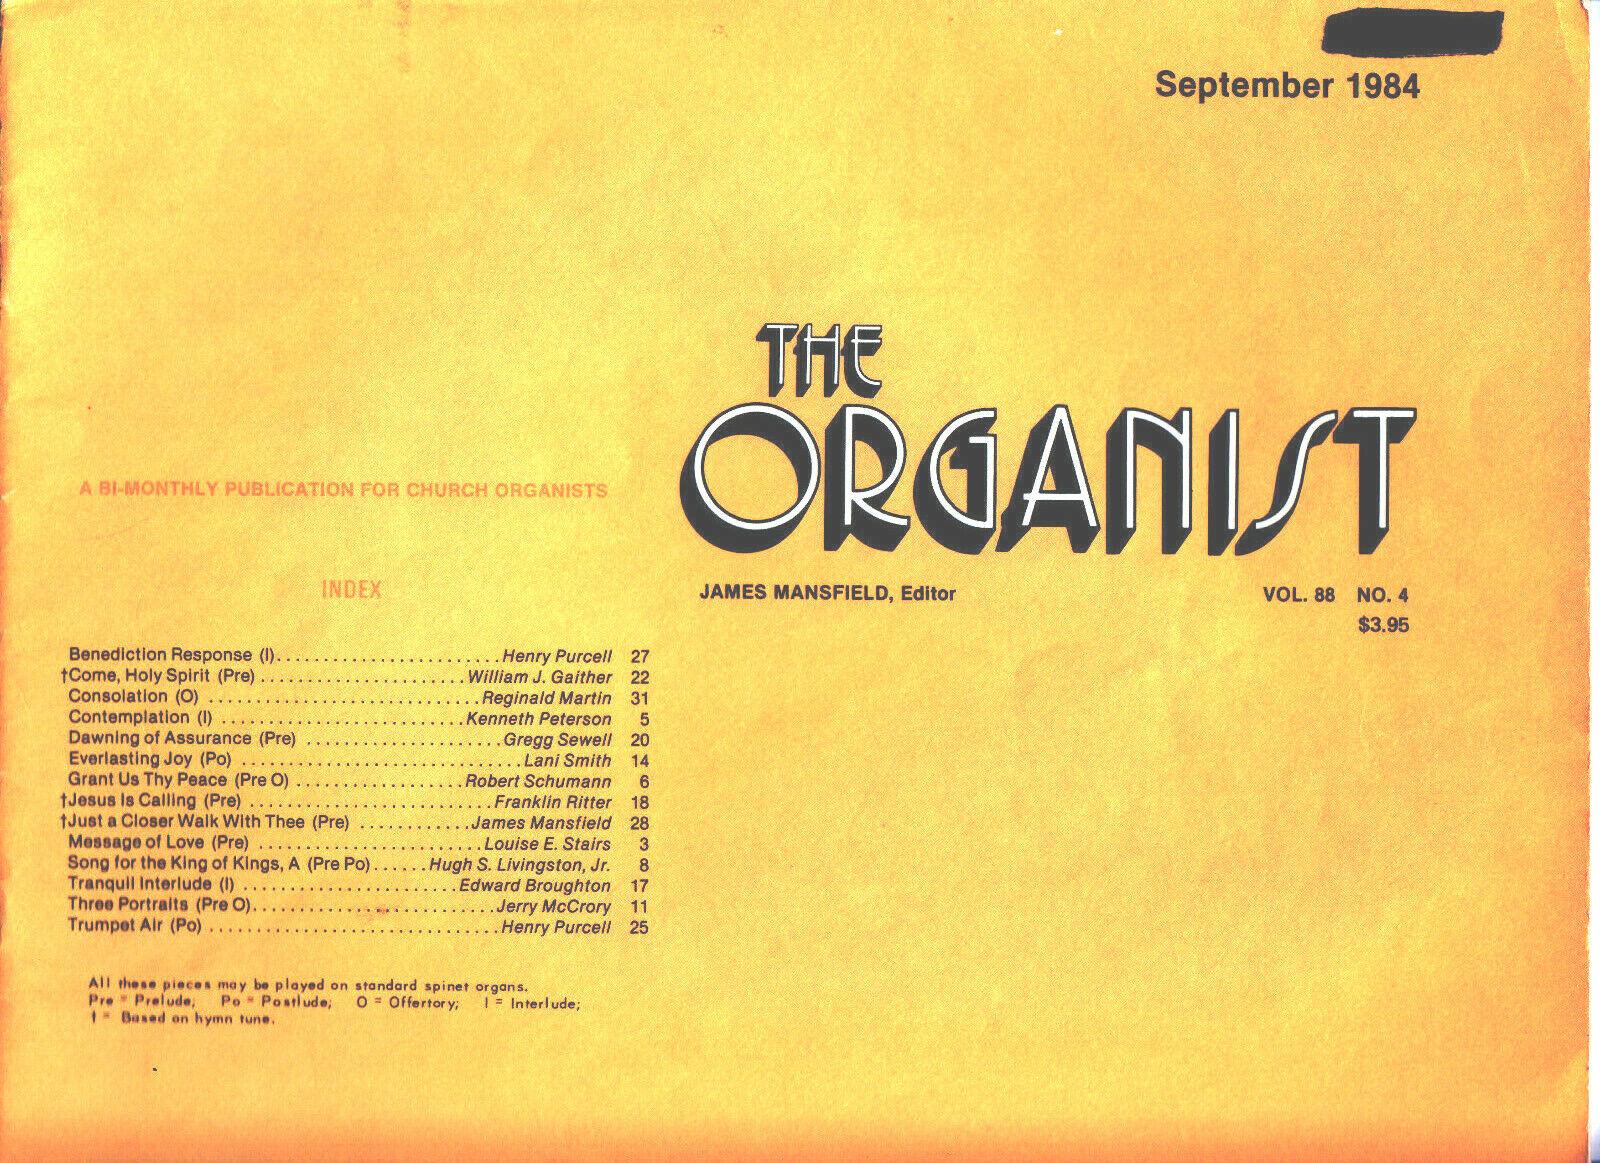 ORGAN MUSIC - THE ORGANIST - SEPTEMBER 1984 - $4.99